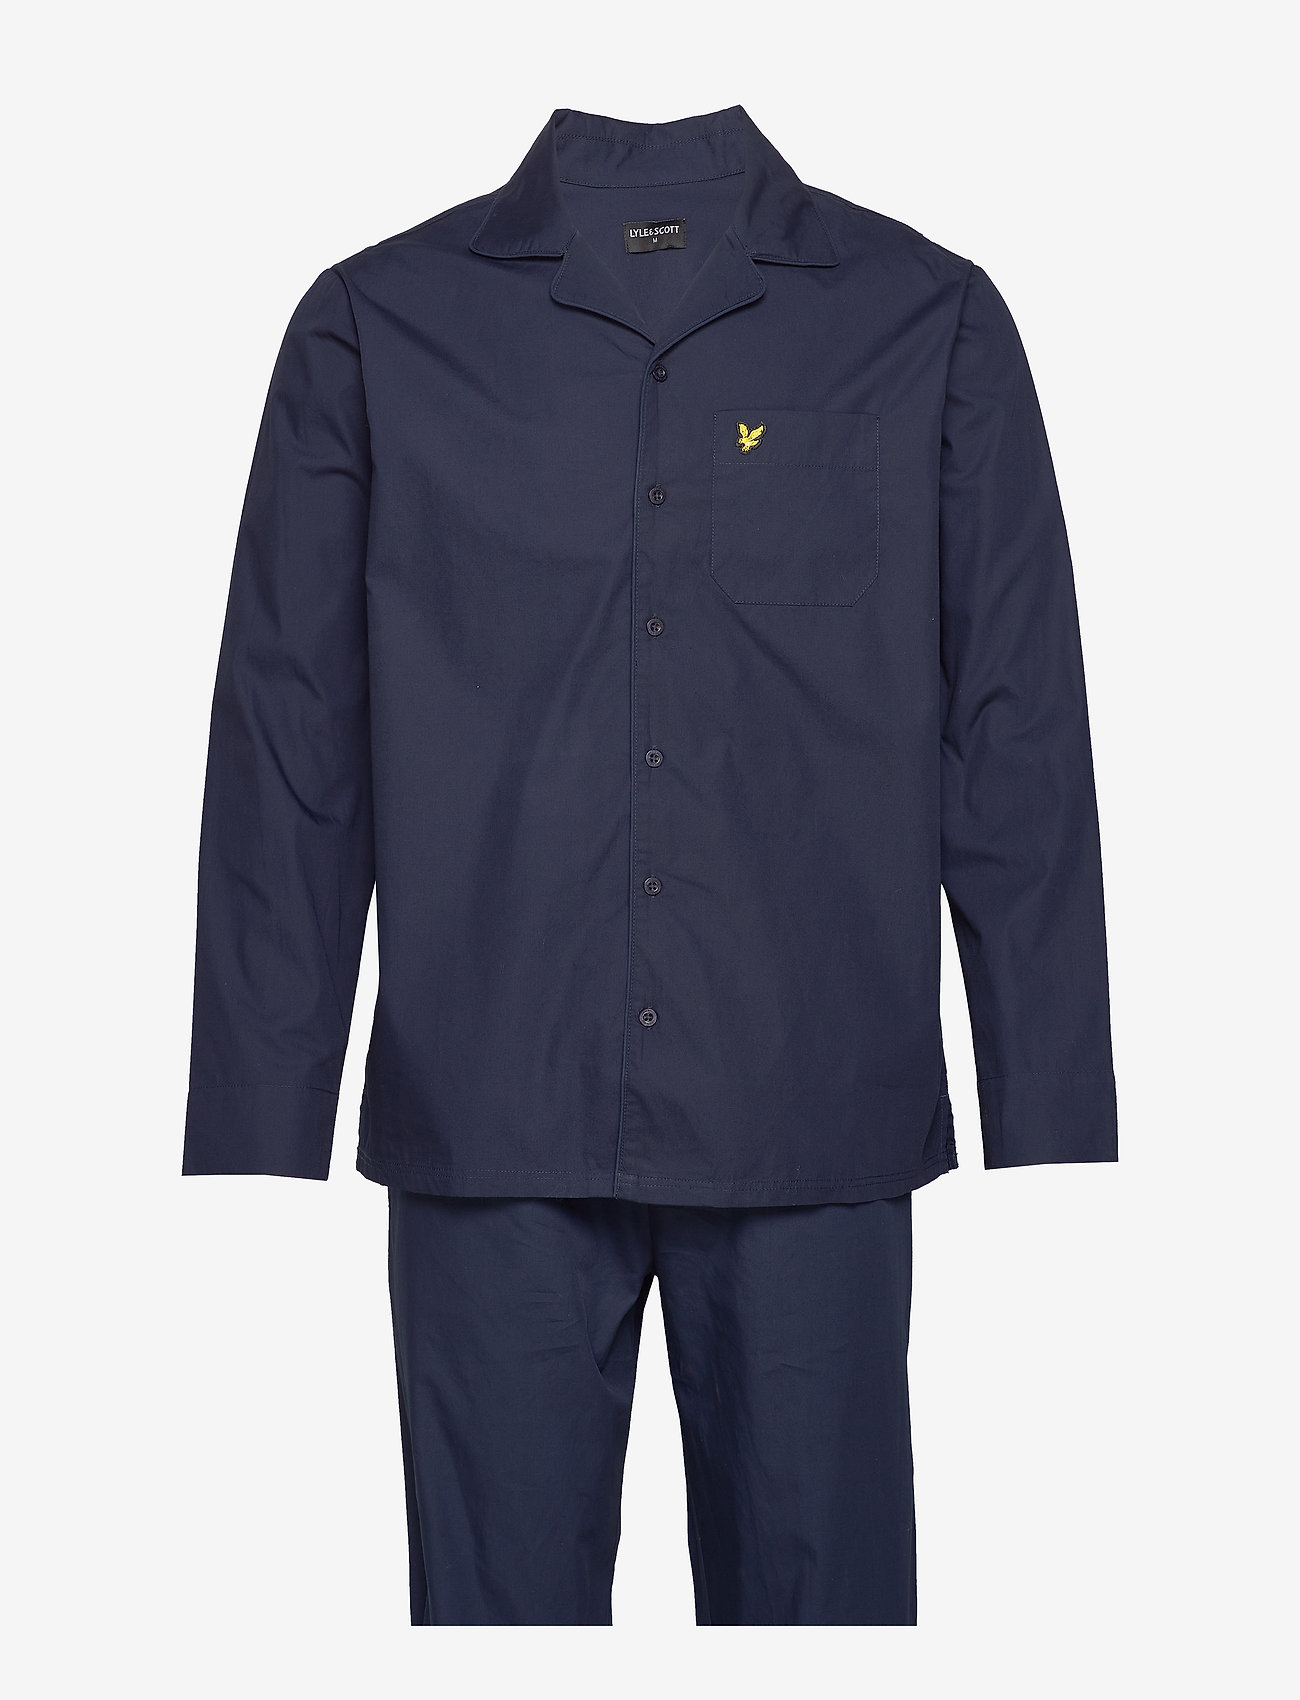 Lyle & Scott - GAVIN - pyjamas - peacoat - 0